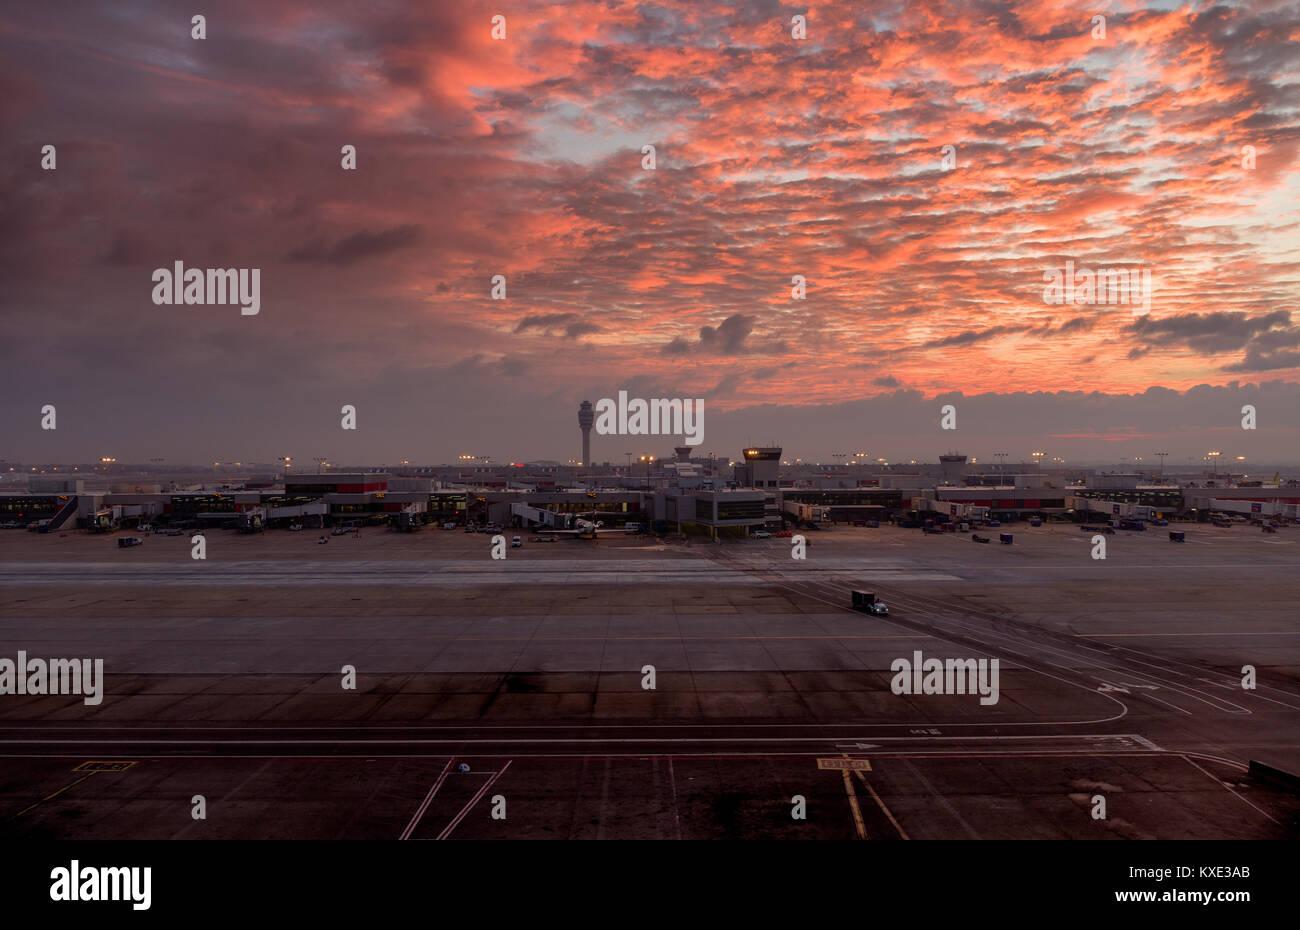 Sunrise over Hartsfield-Jackson Atlanta International Airport - Stock Image